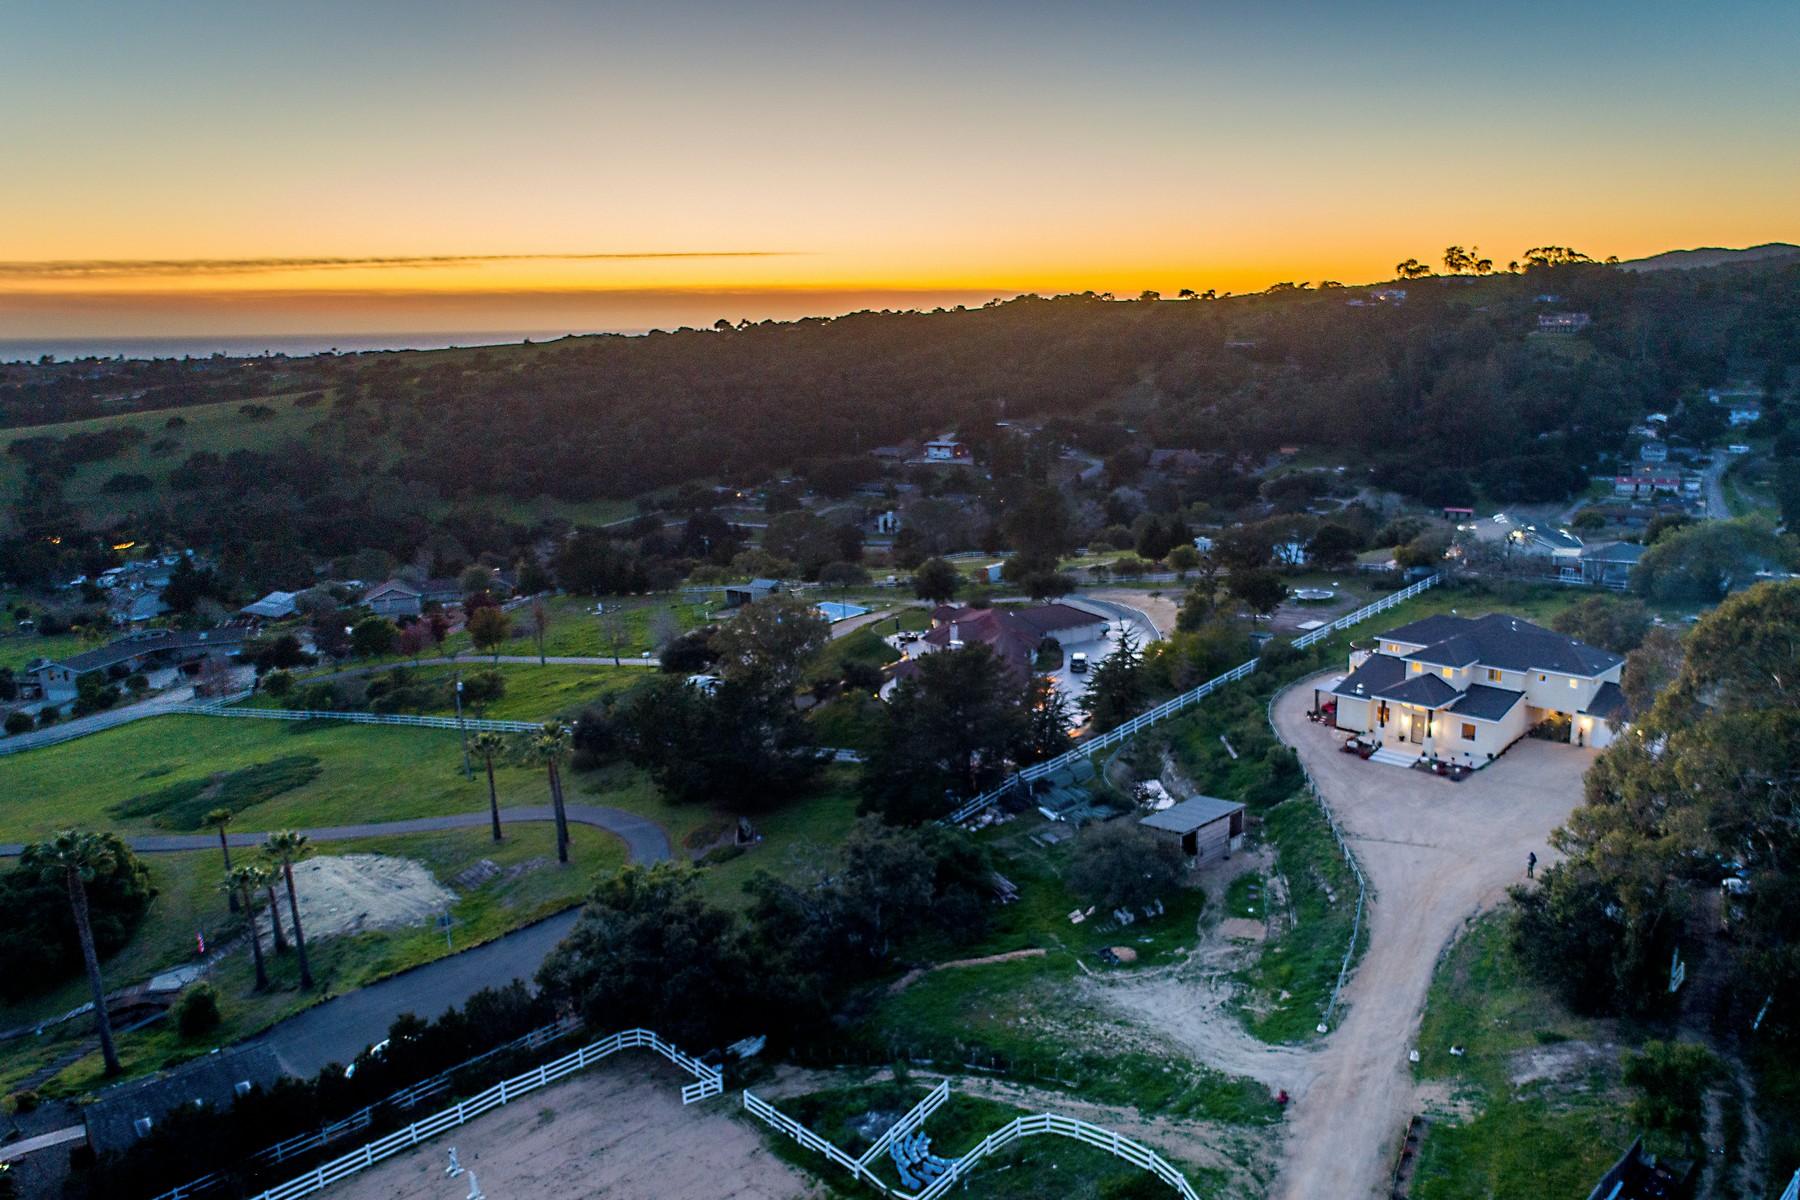 Single Family Homes for Sale at Coastal Equestrian Escape 270 Sunray Place Arroyo Grande, California 93420 United States